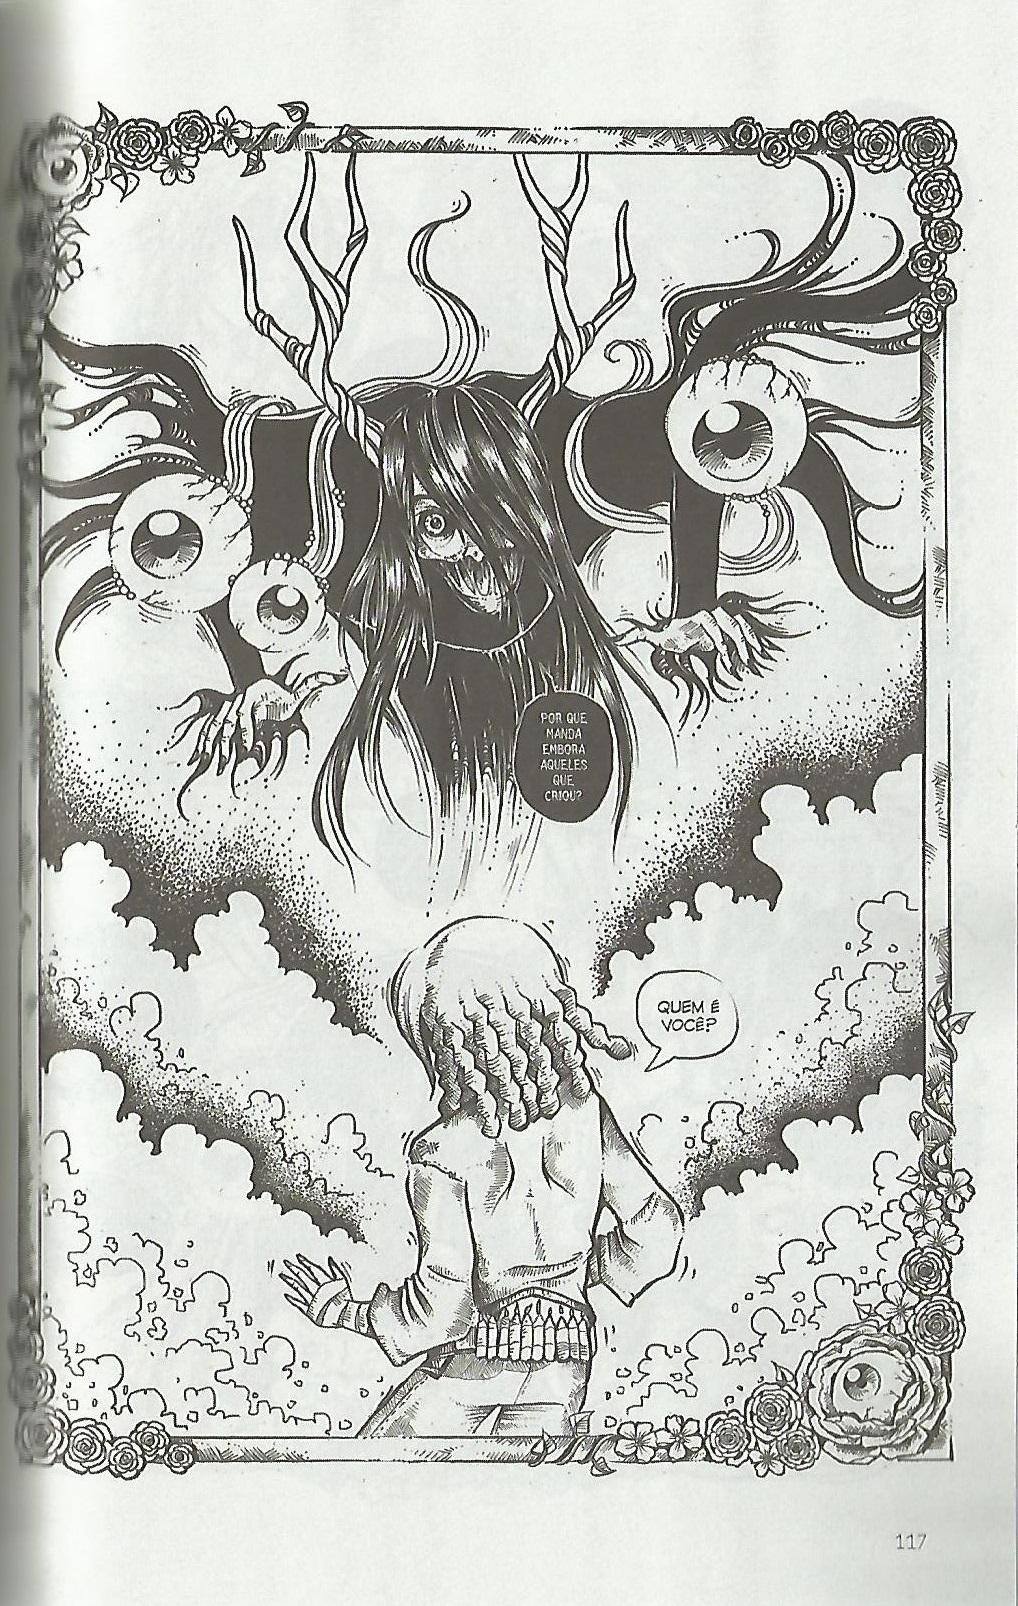 entre monstros2